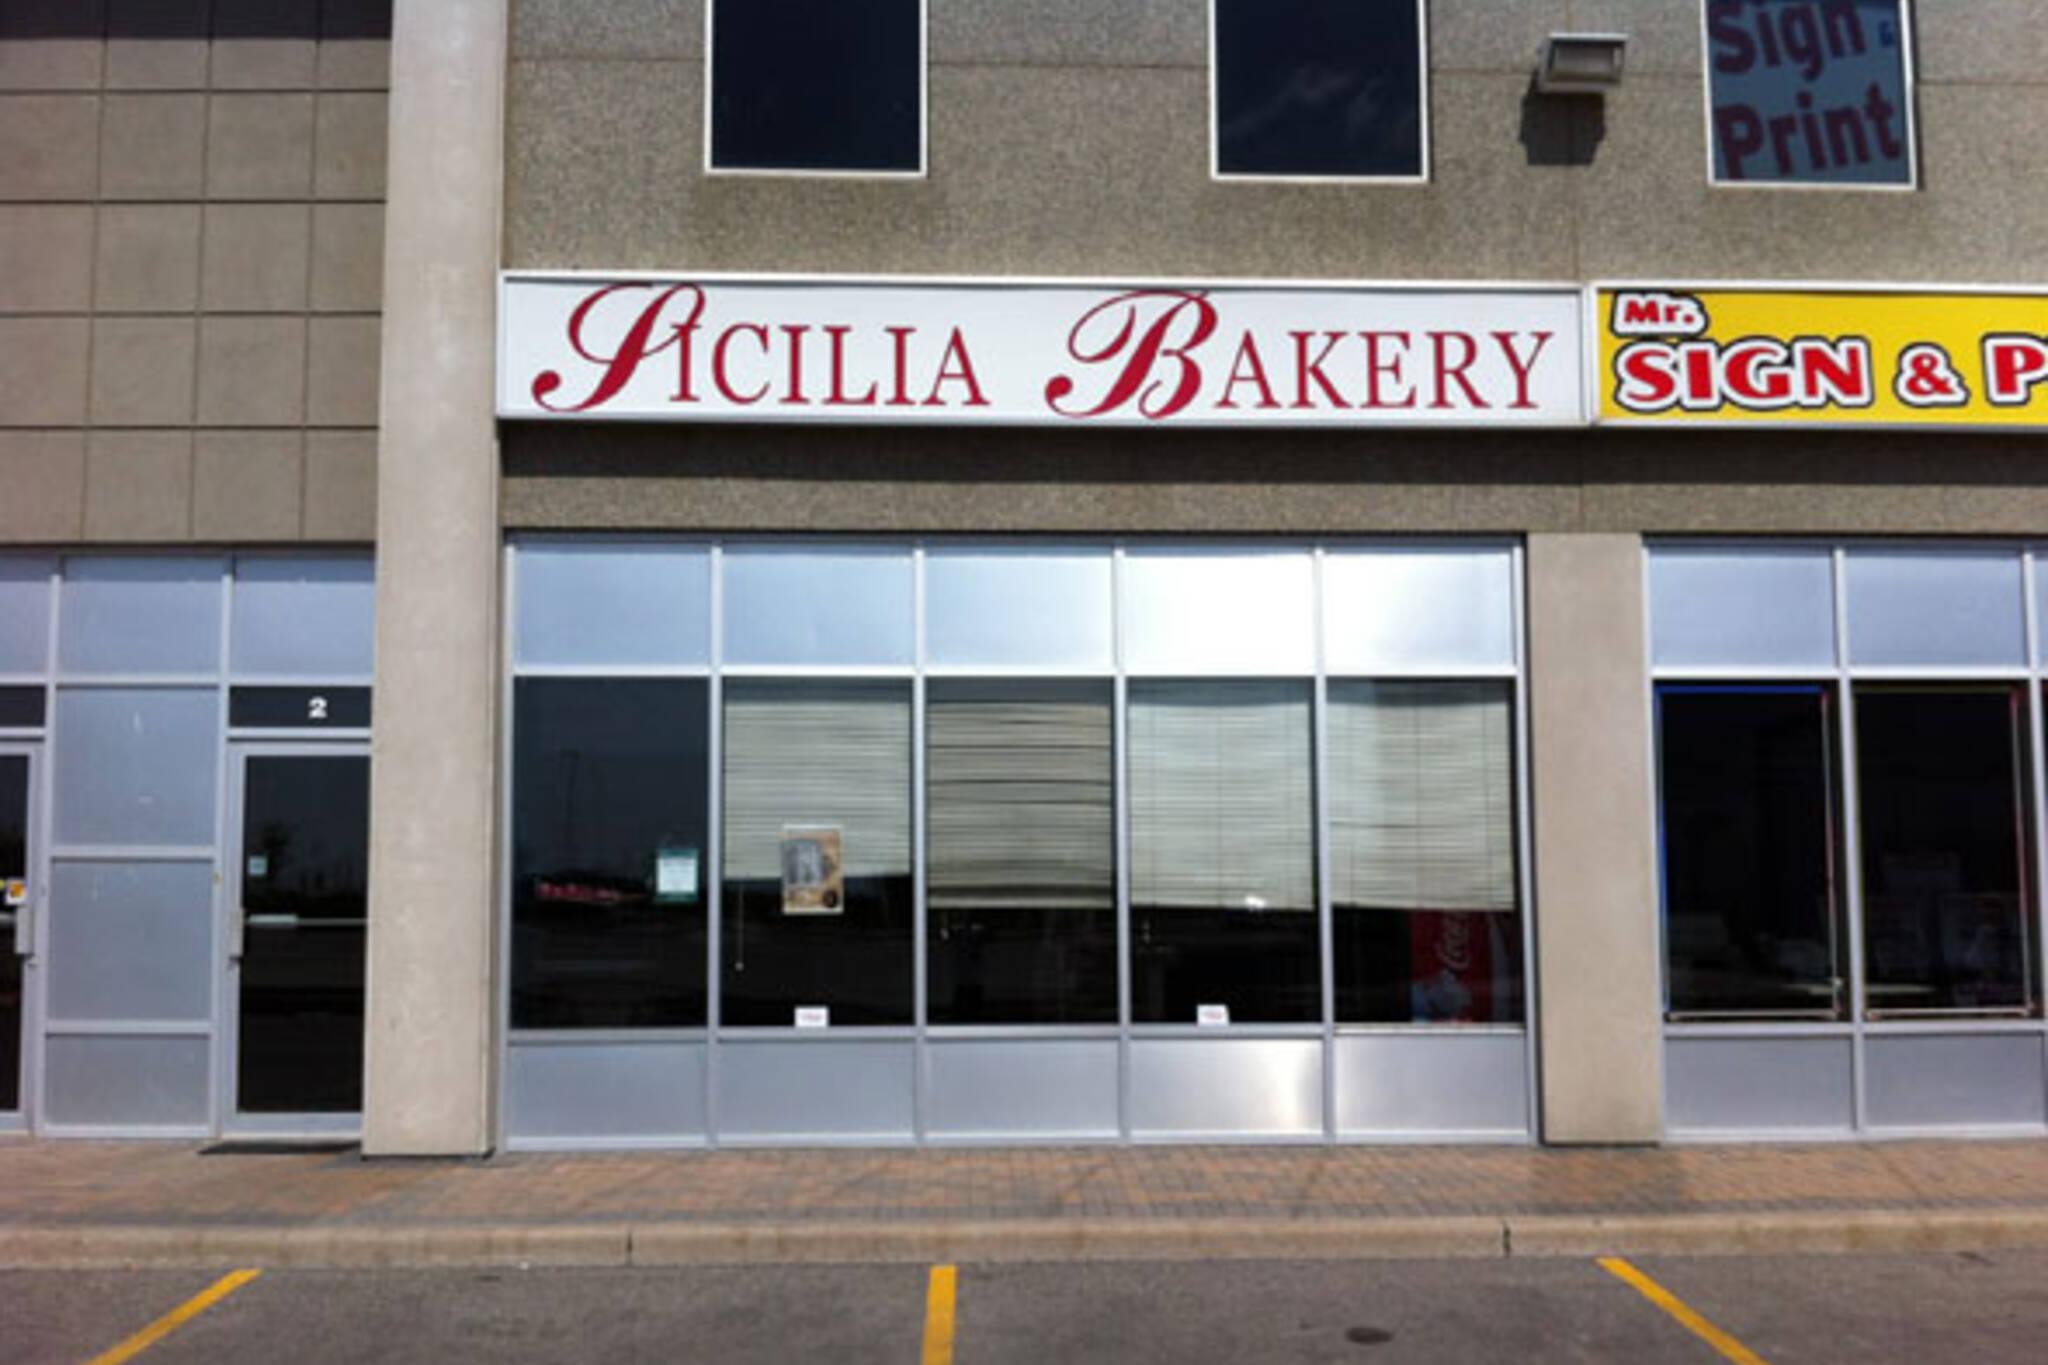 Sicilia Bakery